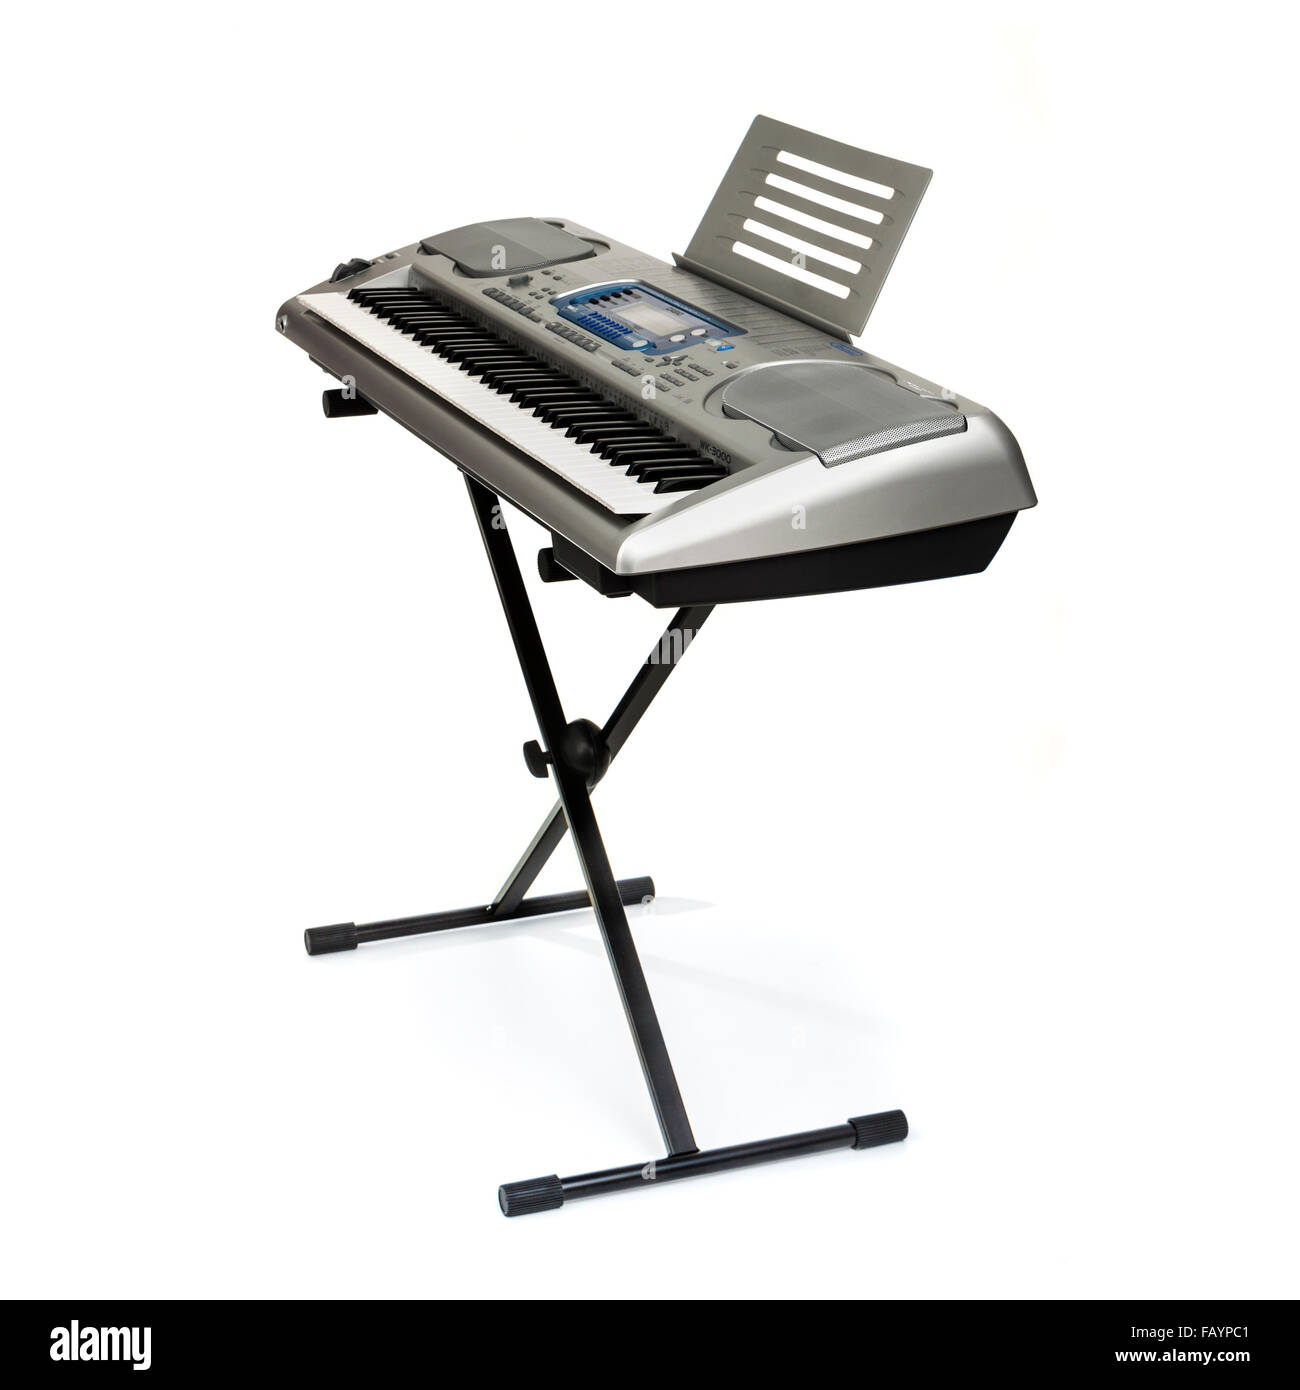 Casio WK-3000 electronic 76-key music keyboard from 2004 - Stock Image